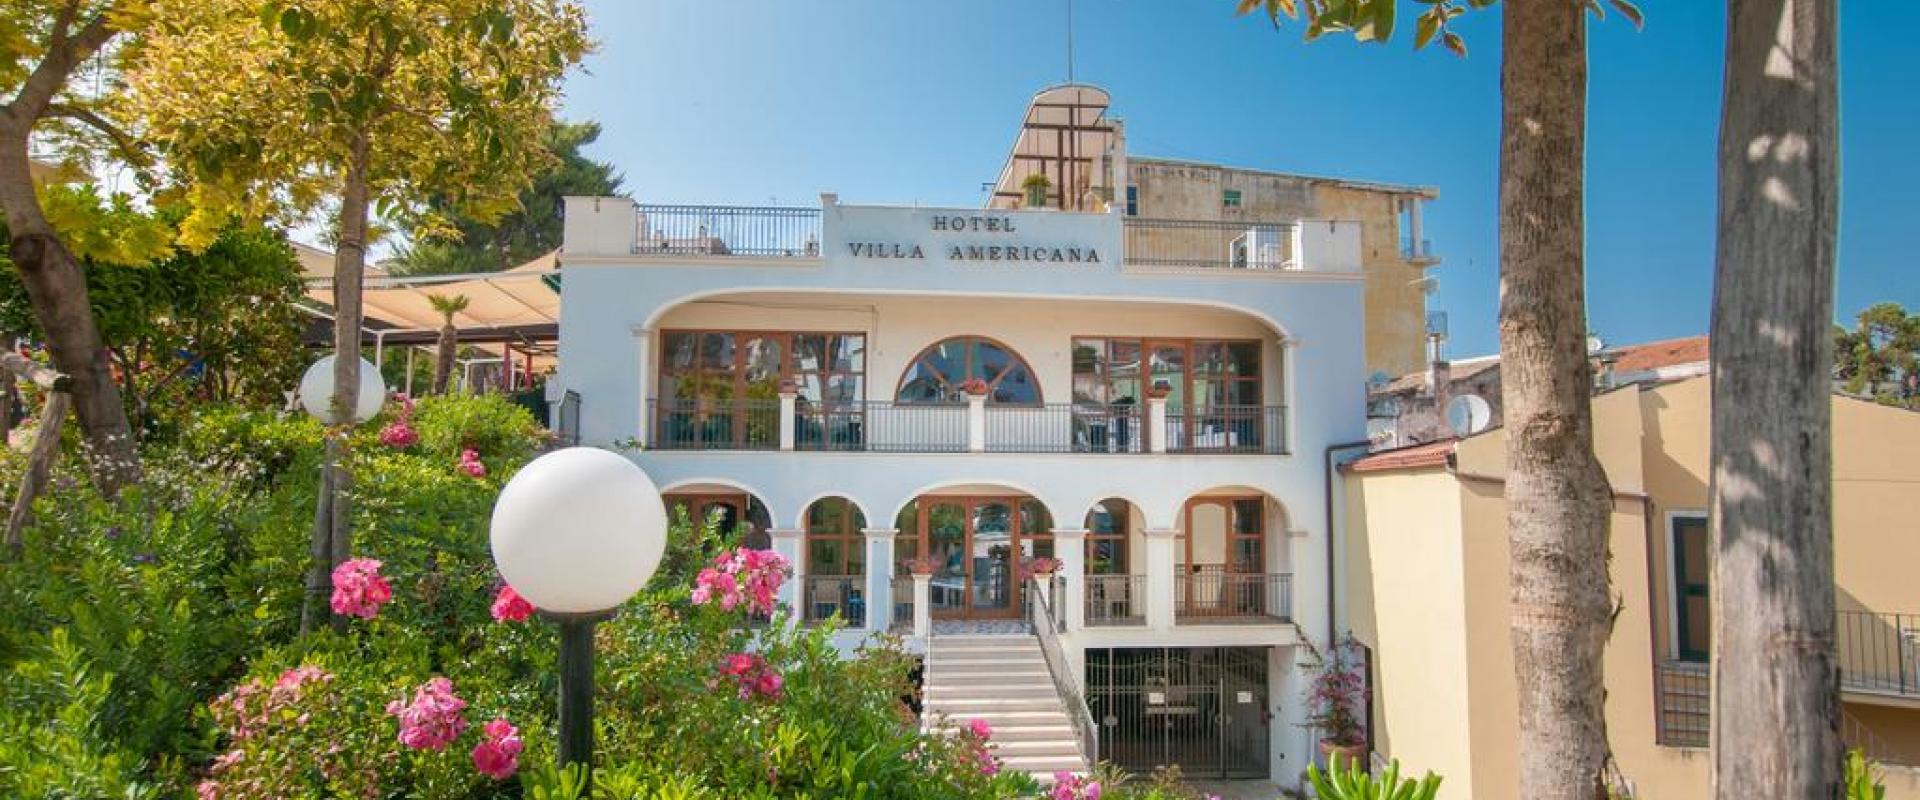 Hotel in Gargano Regional Park area